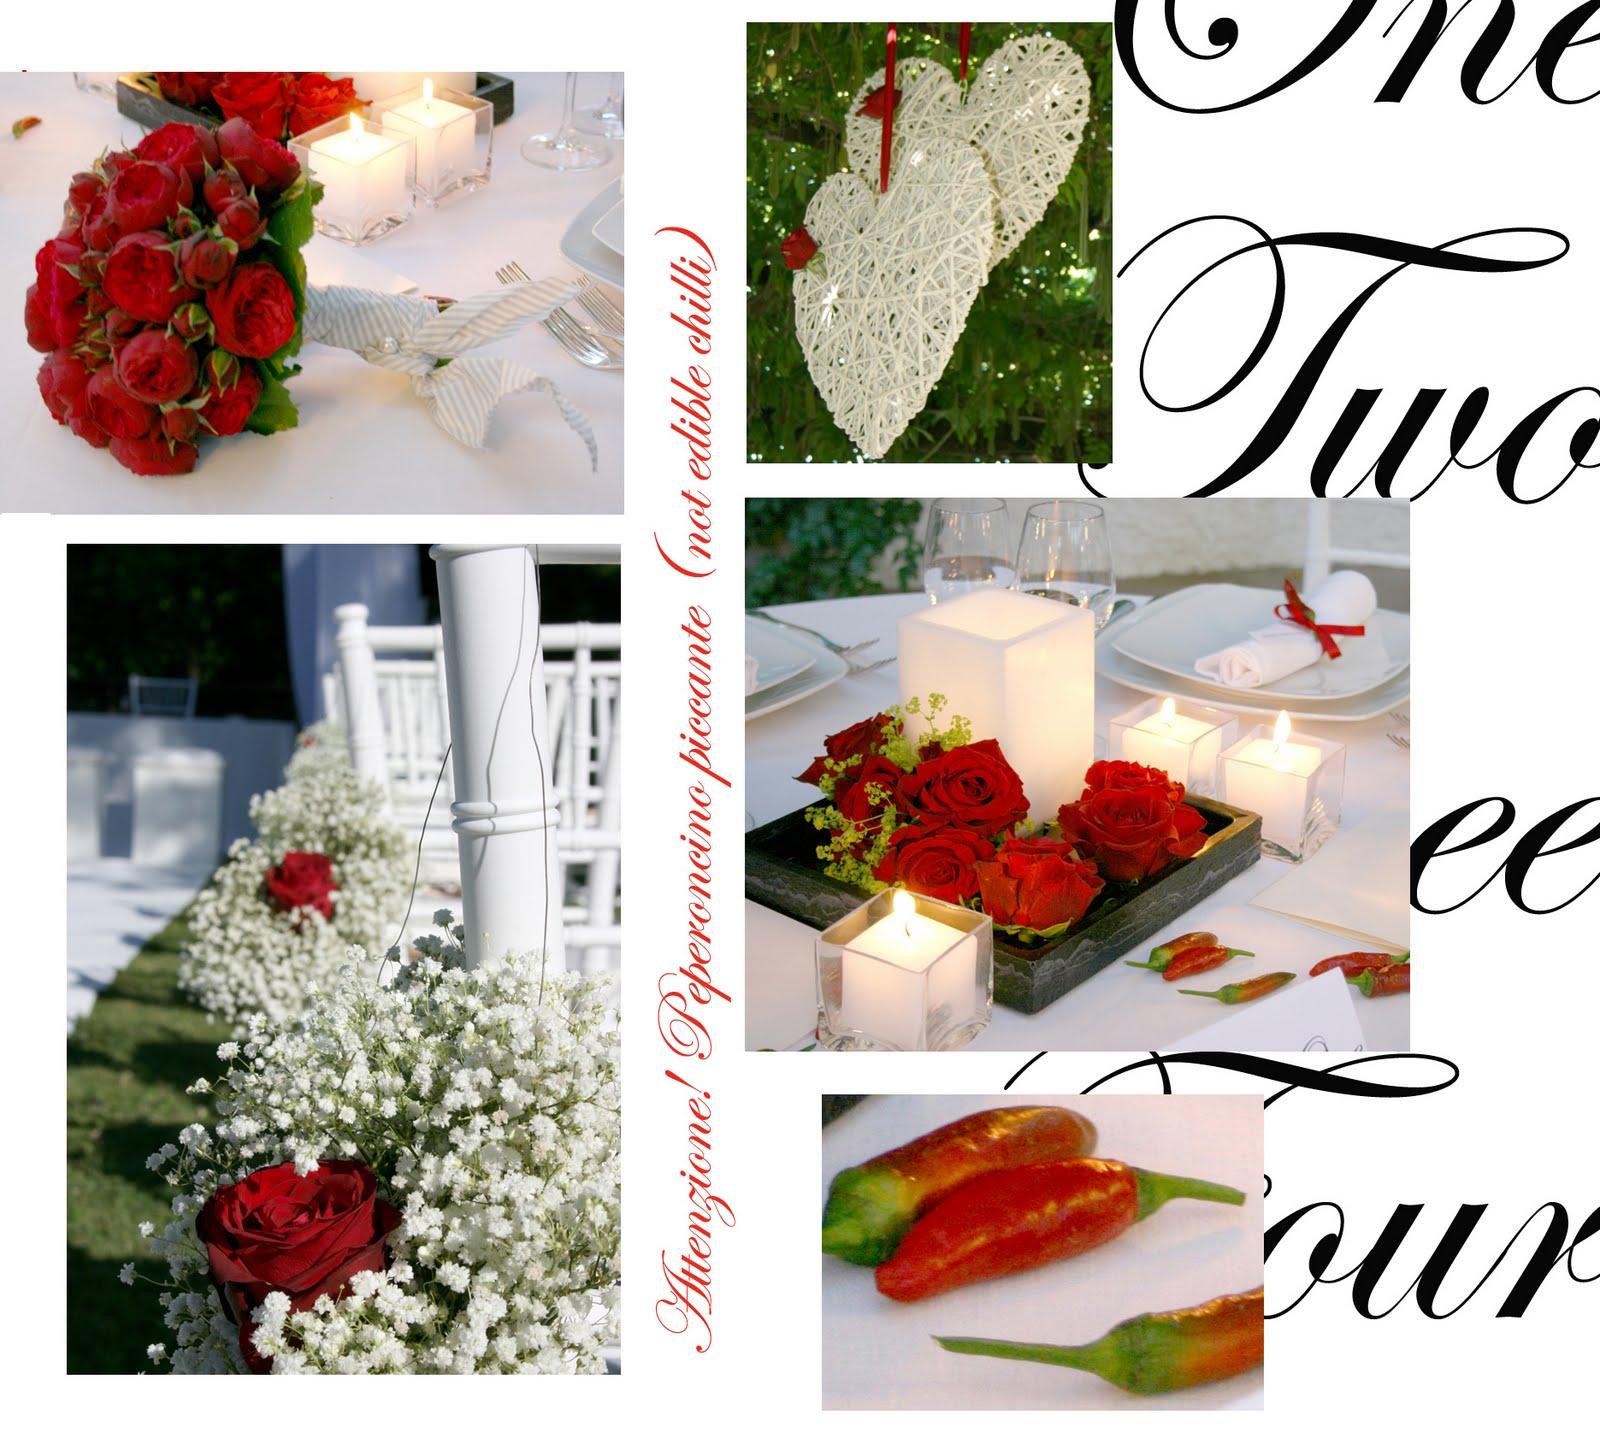 Matrimonio Tema Peperoncino : Flobywedding organizzatori di matrimoni tema bianco e rosso